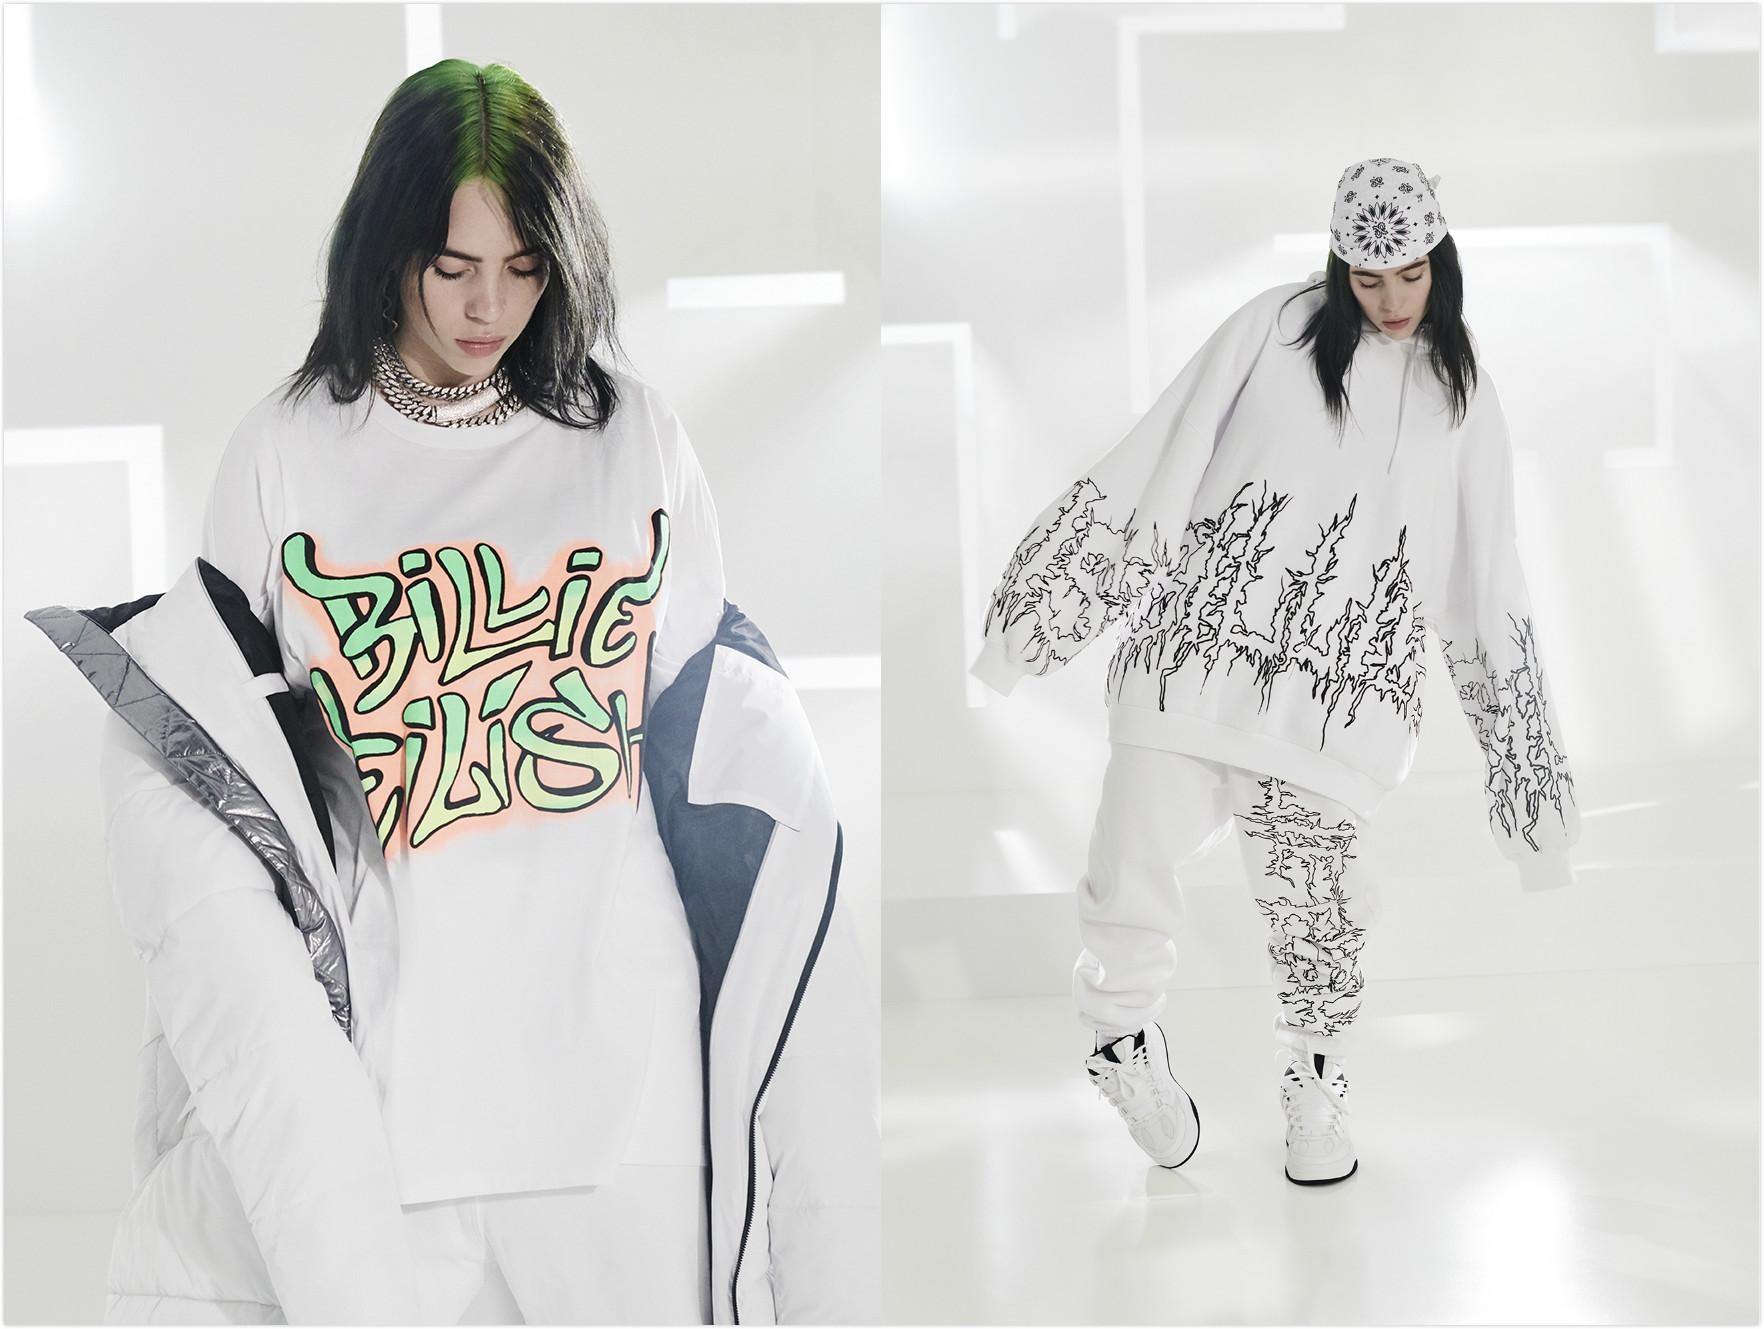 Billie Eilish x Bershka 合作胶囊系列